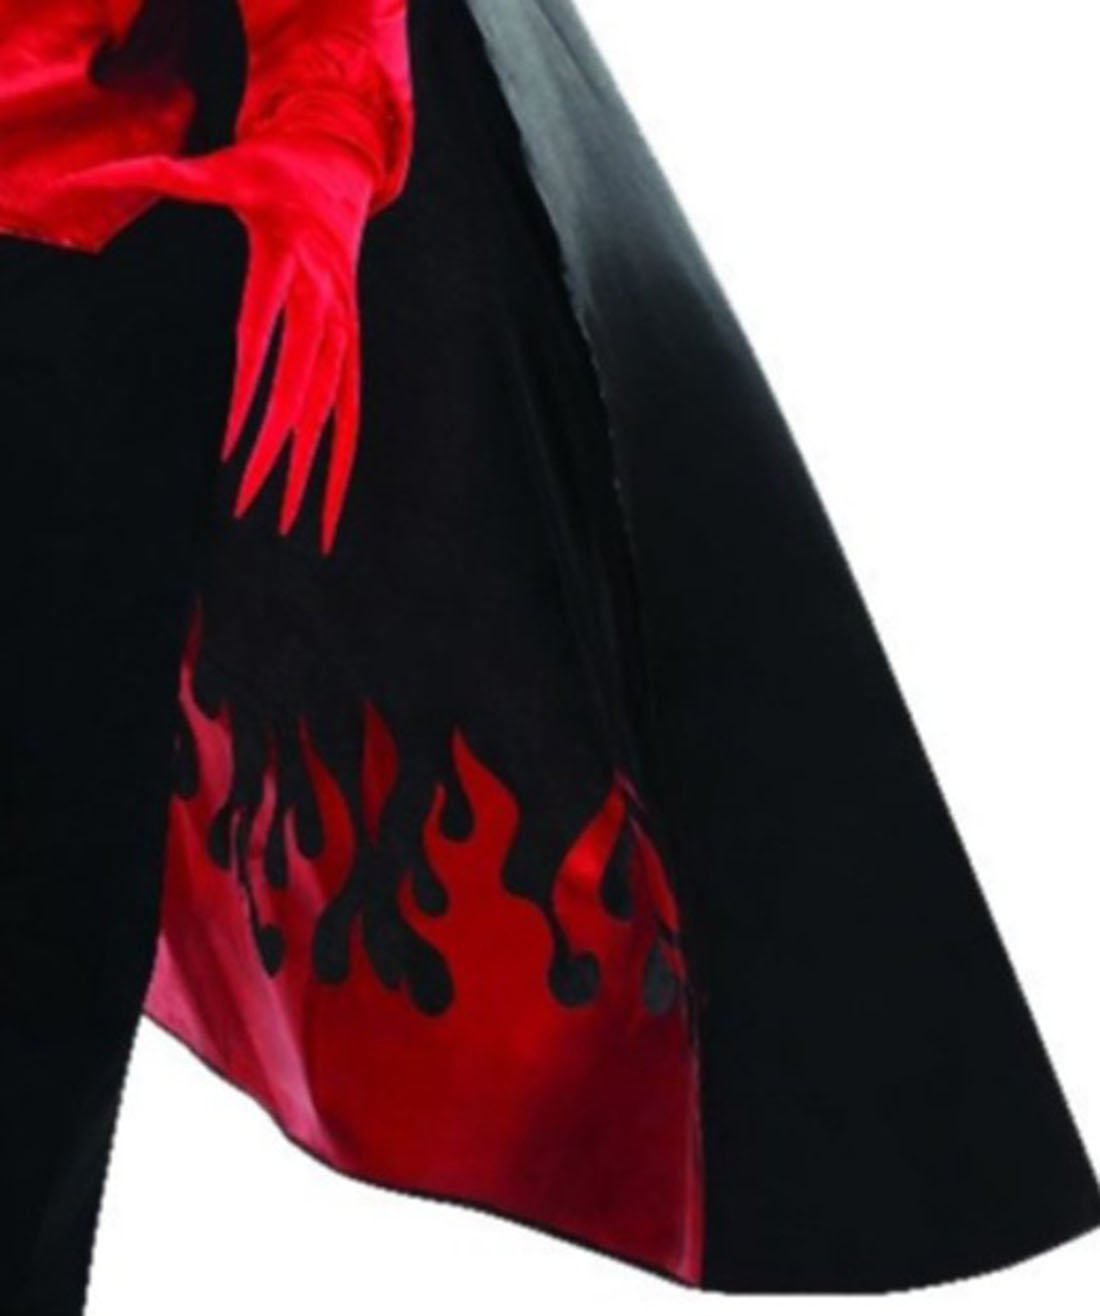 Karnevalsbud - Herren Teufel Diablo Kostüm mit Hemd Weste Weste Weste Umhang und Handschuhen, M/L, Rot f0bbf7